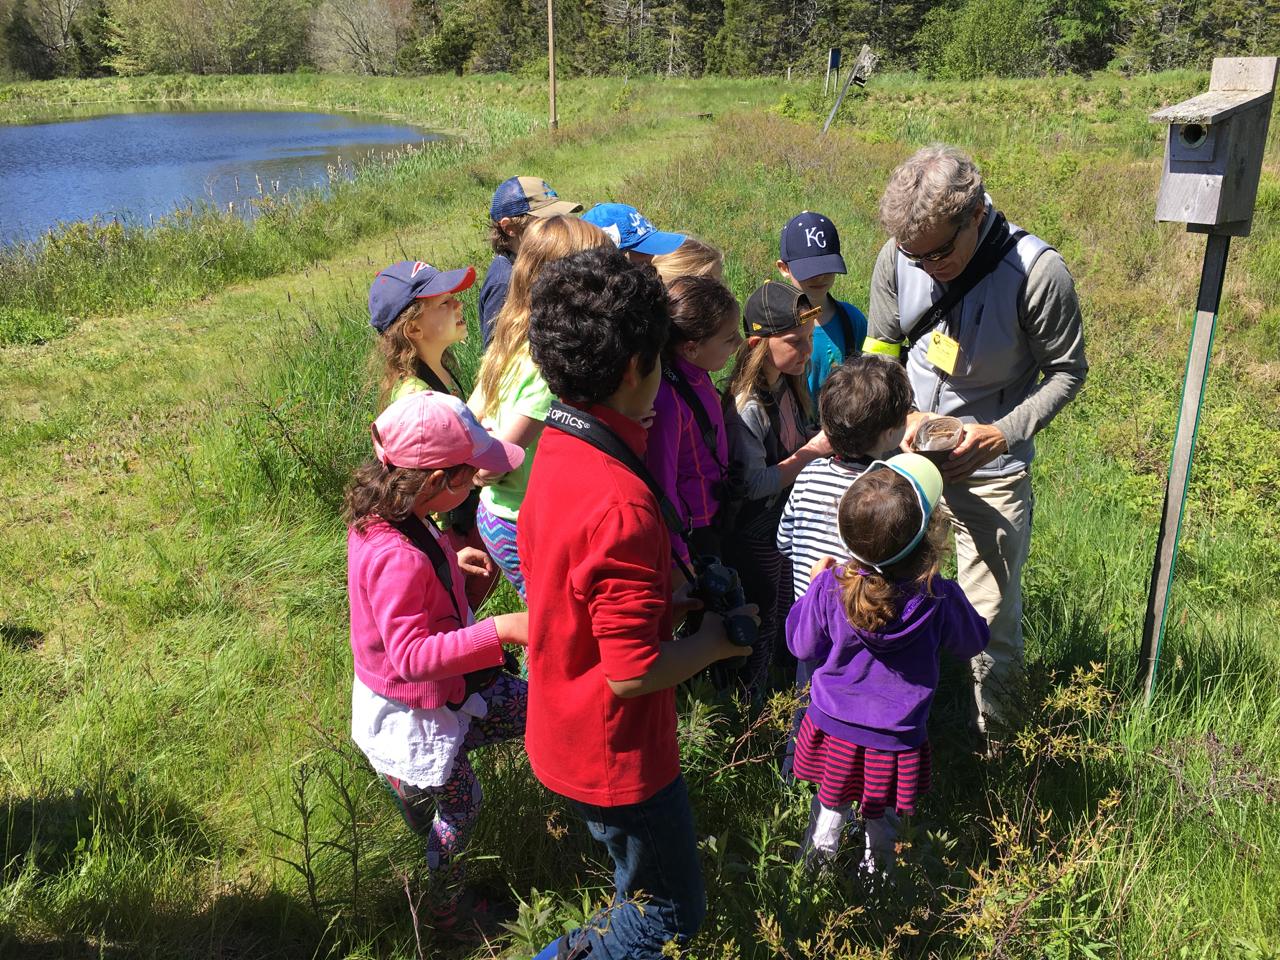 Billy Helprin shows the kids a Tree Swallow nest